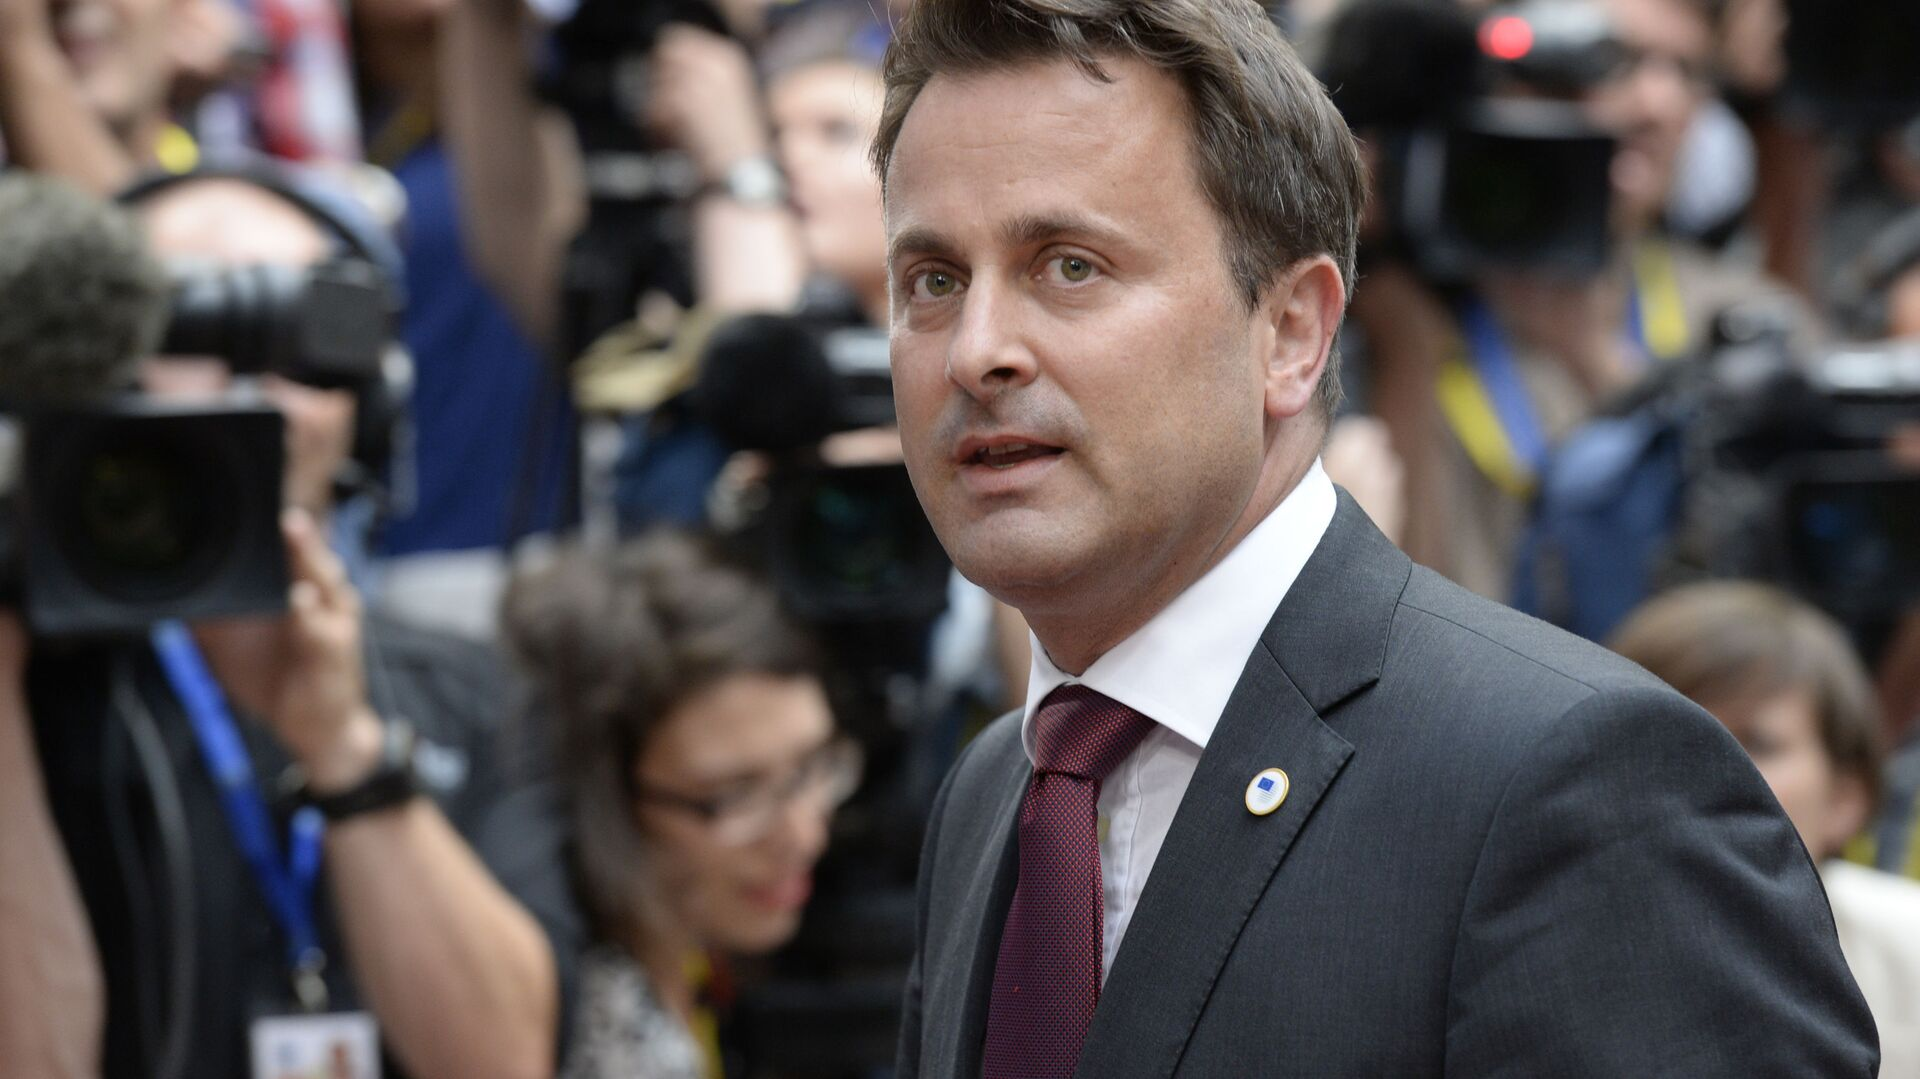 Il primo ministro lussemburghese Xavier Bettel - Sputnik Italia, 1920, 05.07.2021